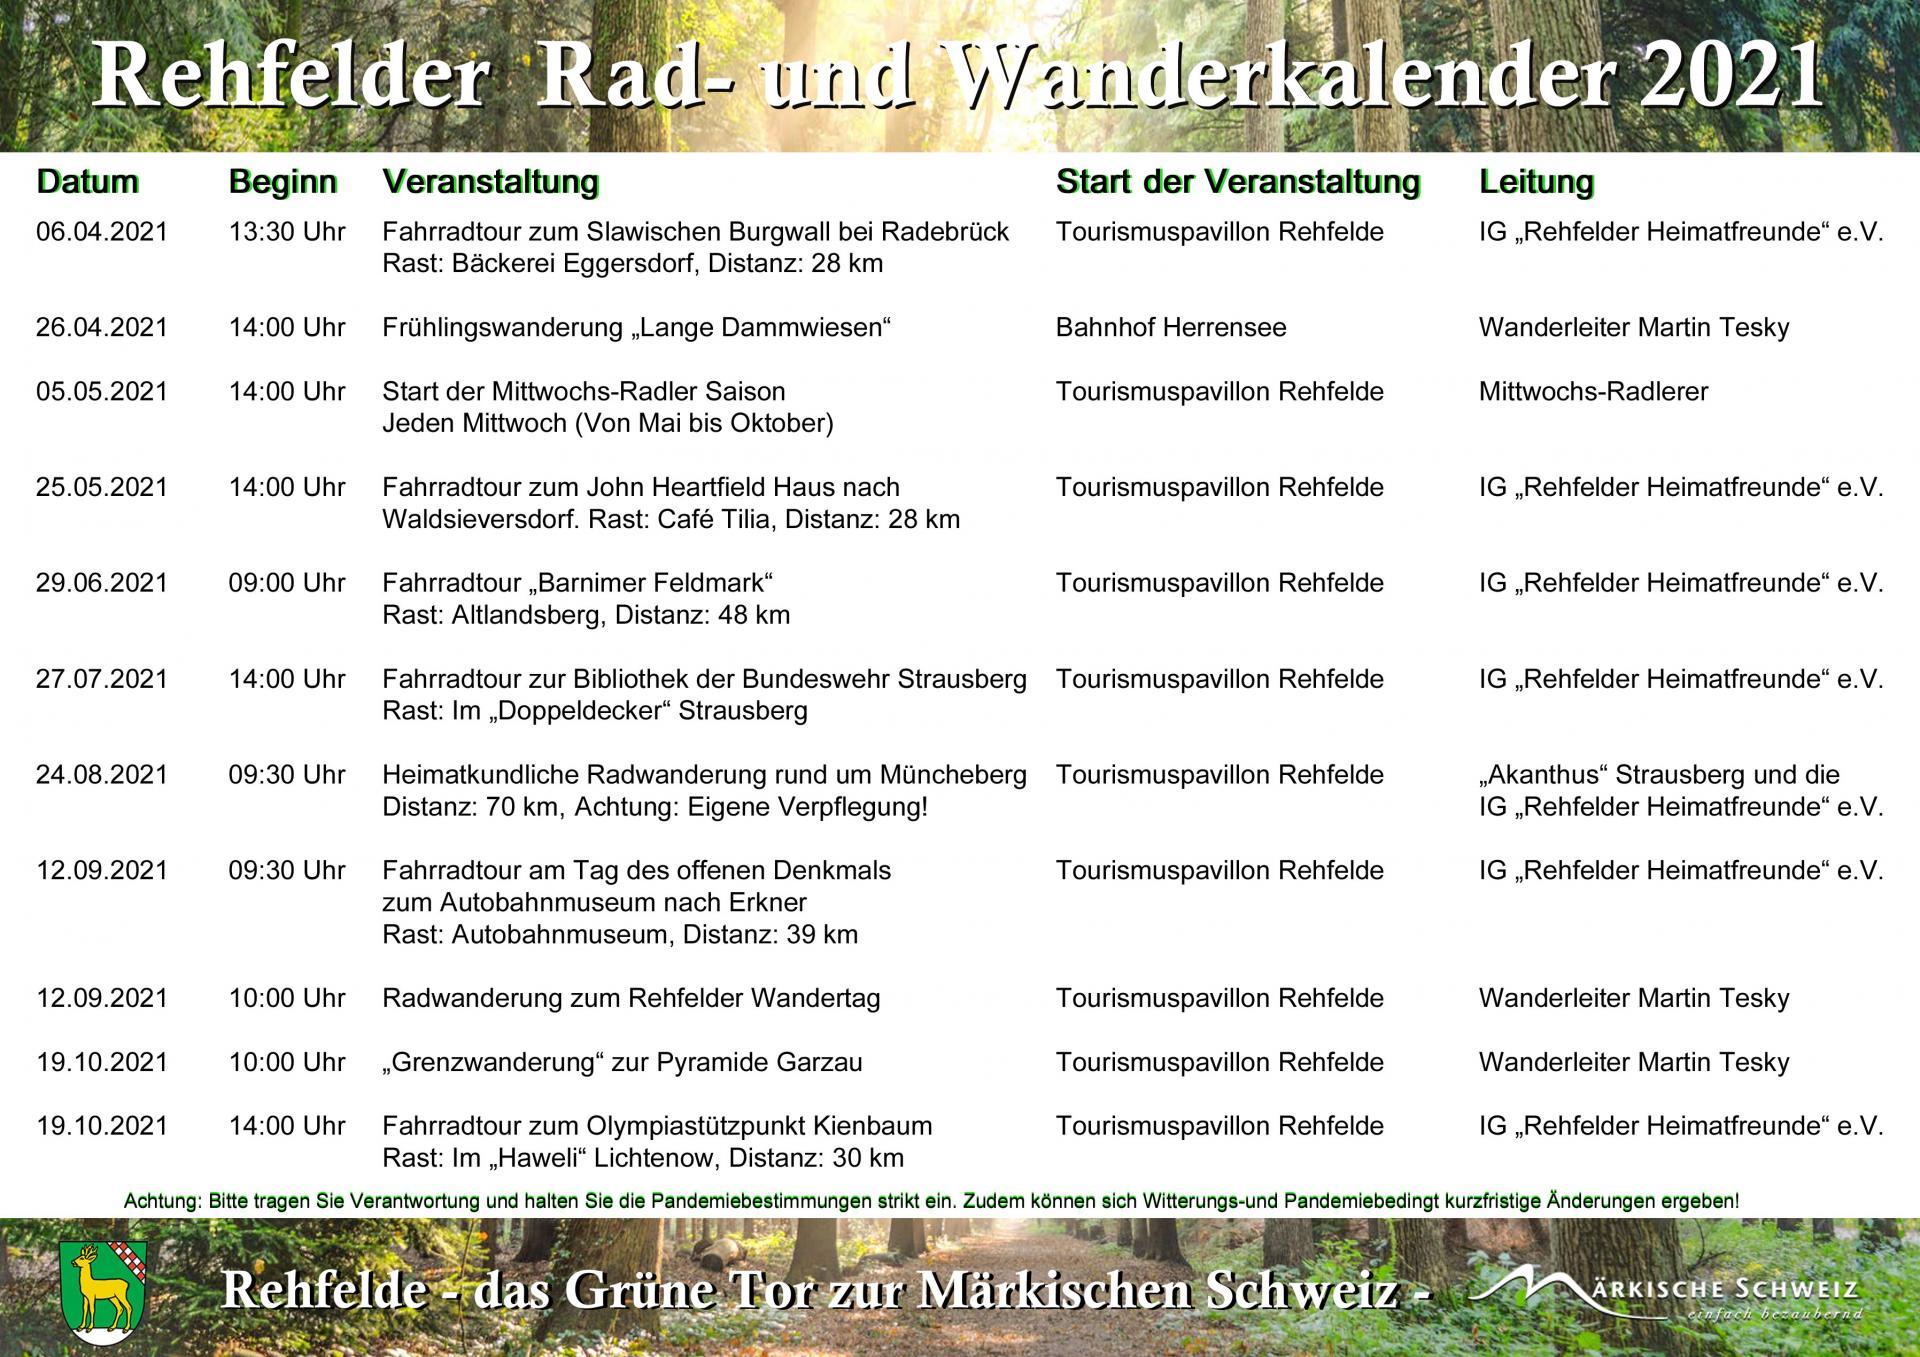 Rehfelder_Wanderkalender_2021